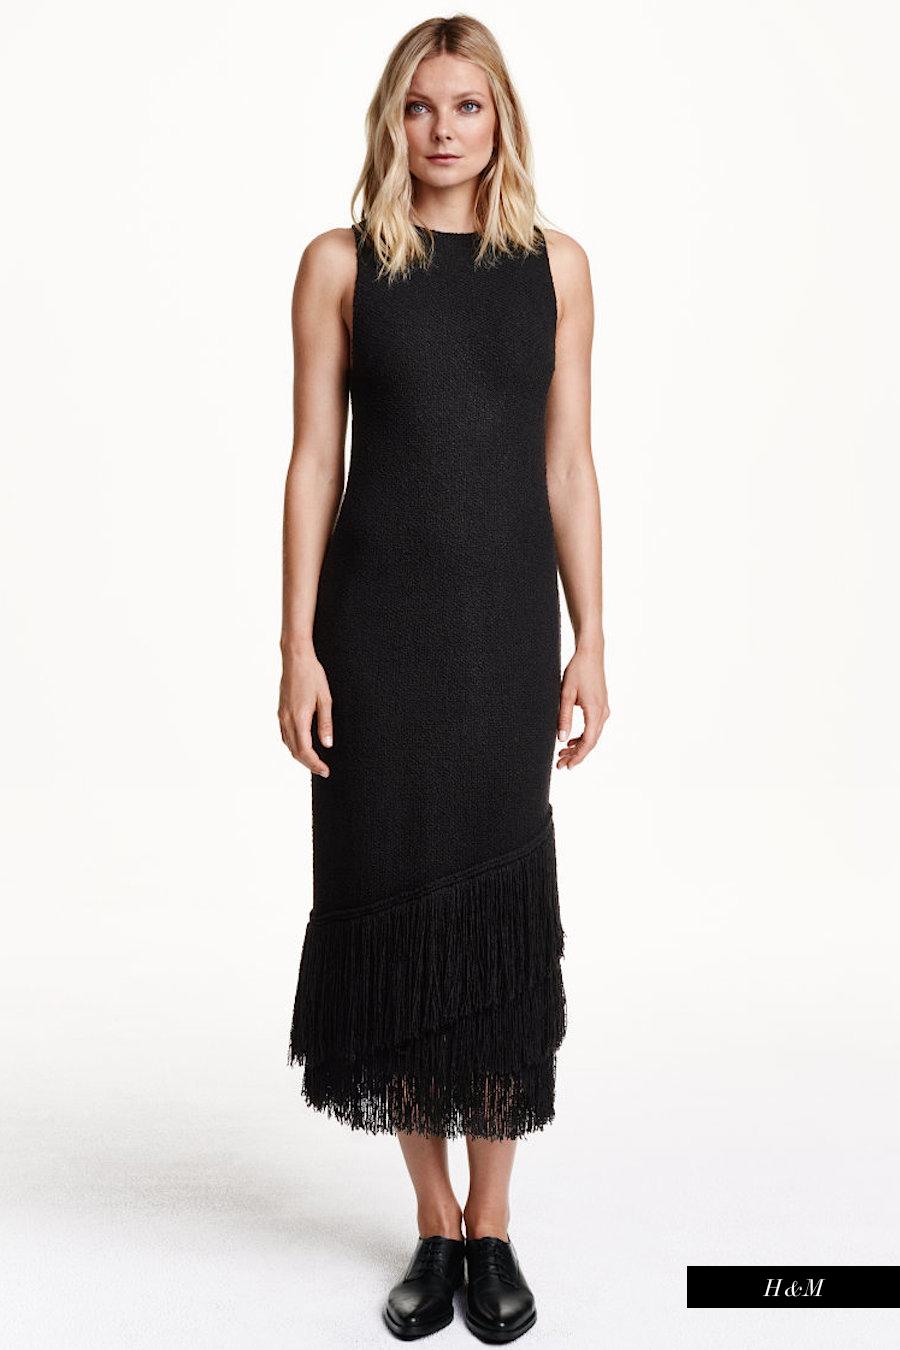 Maxi dress under 200 fash-n-chips.com 13